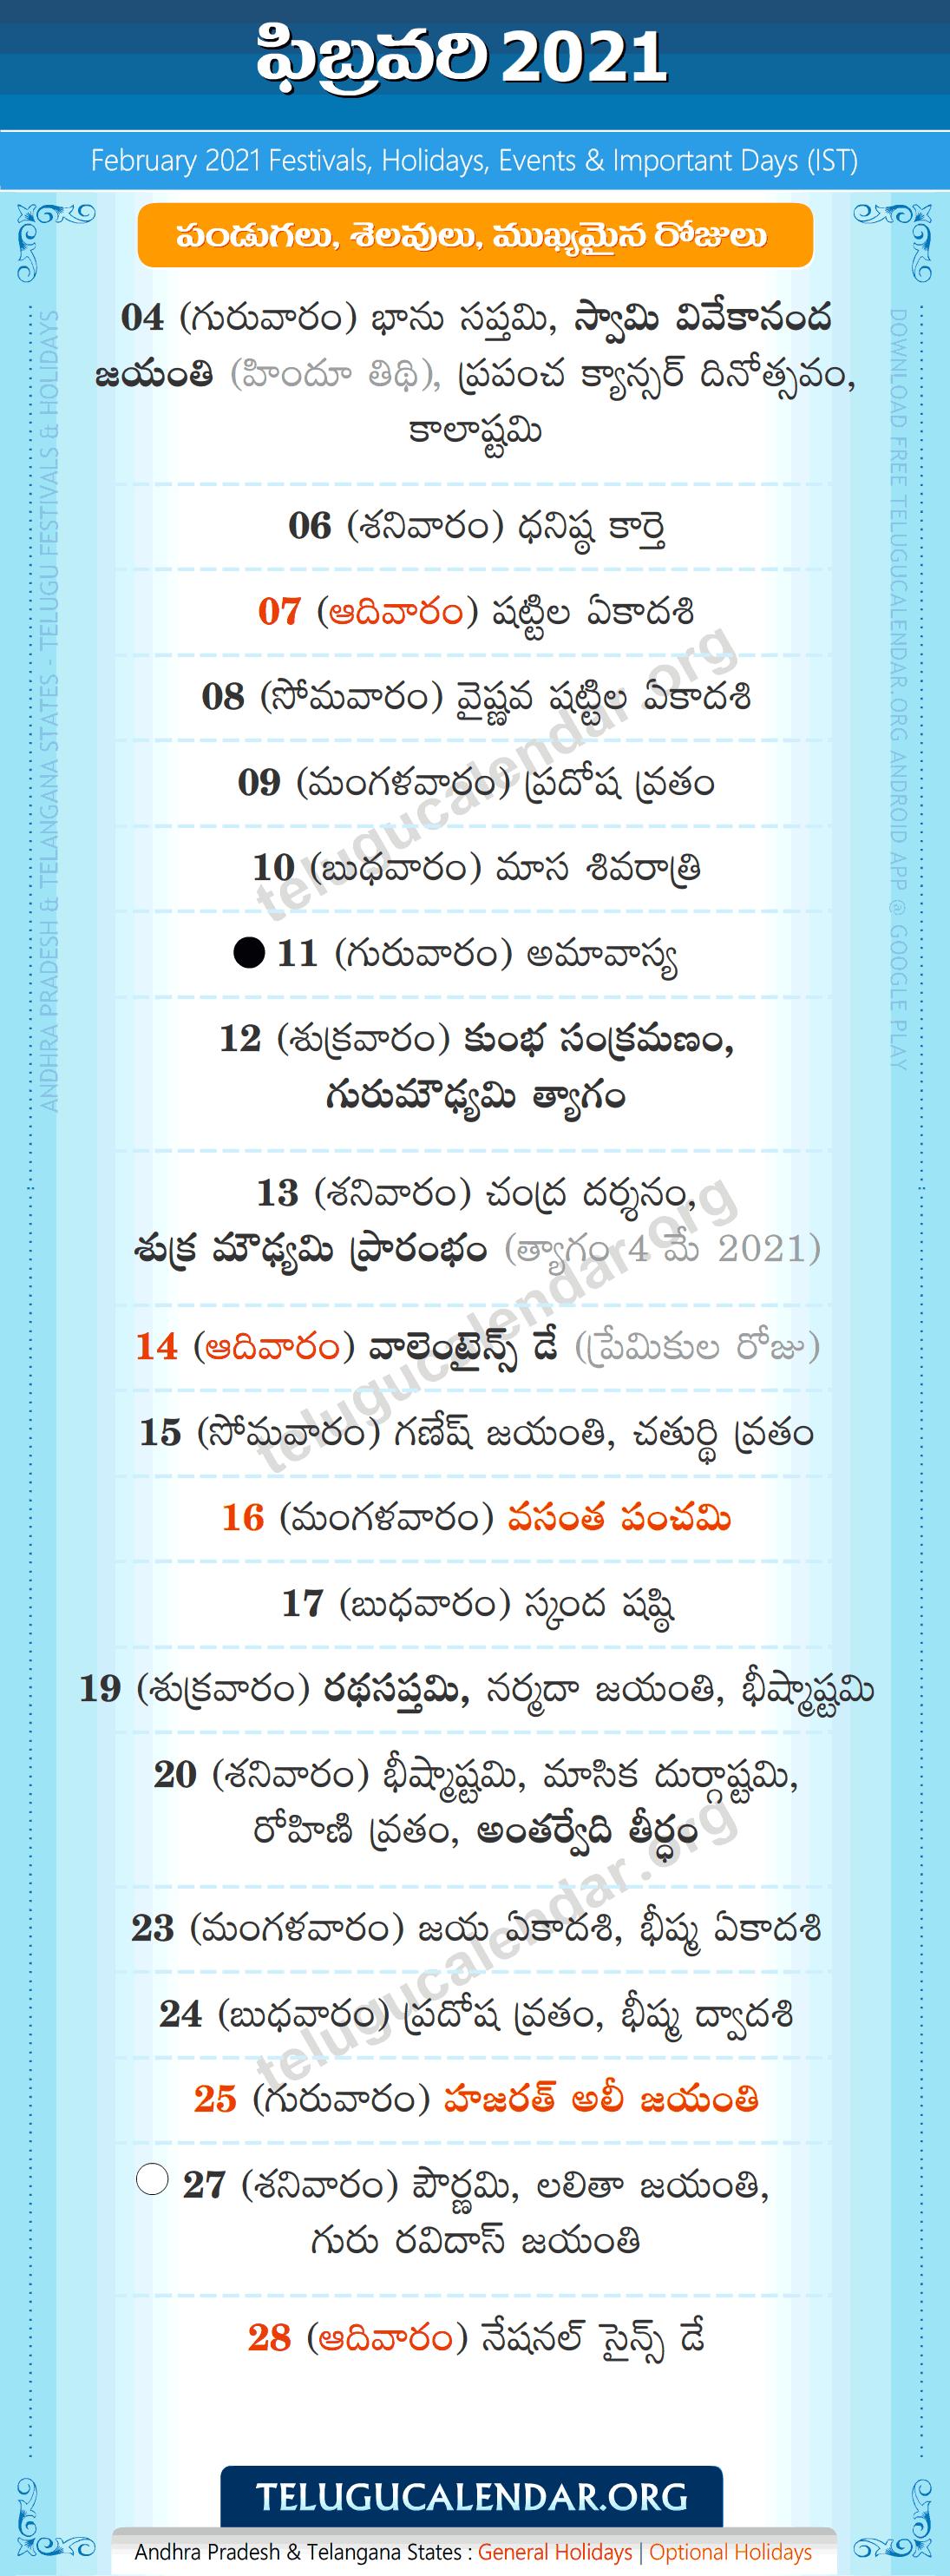 Telugu Calendar 2022 February.Telugu Festivals 2021 February